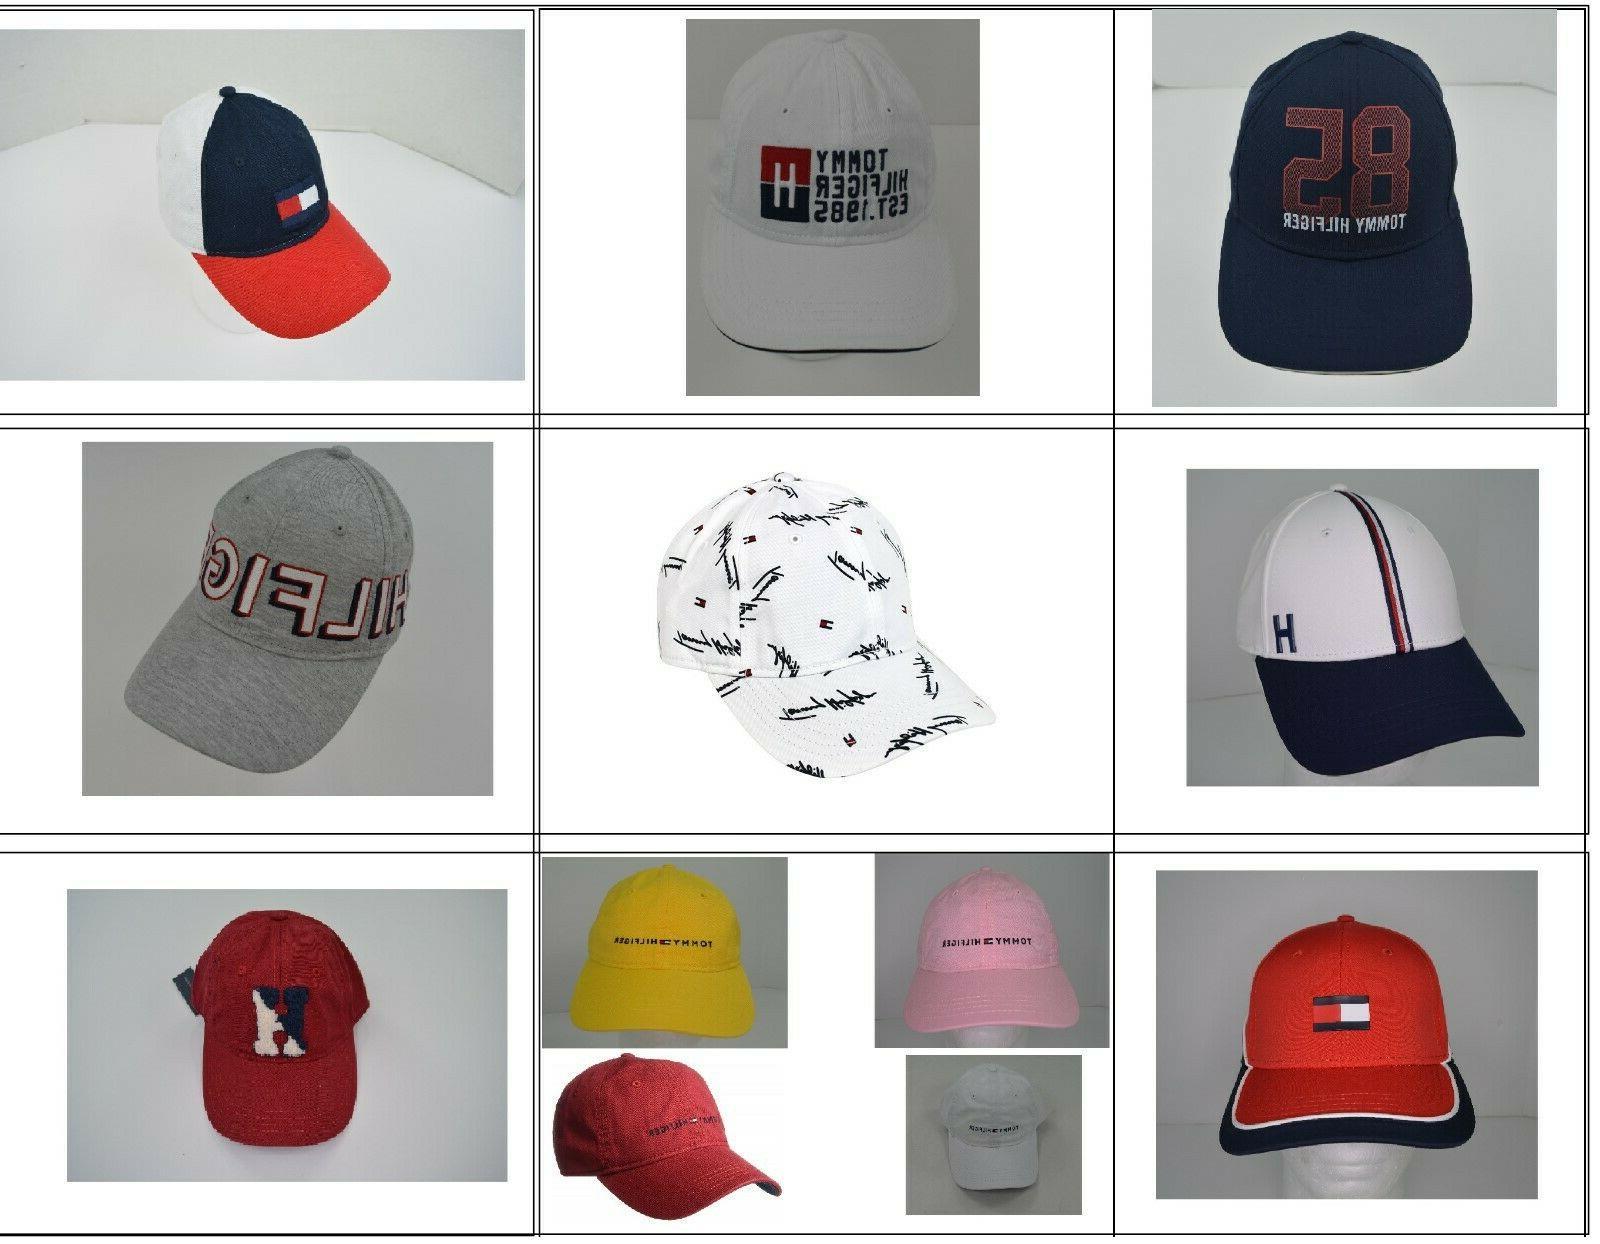 nwt cotton baseball cap men women unisex